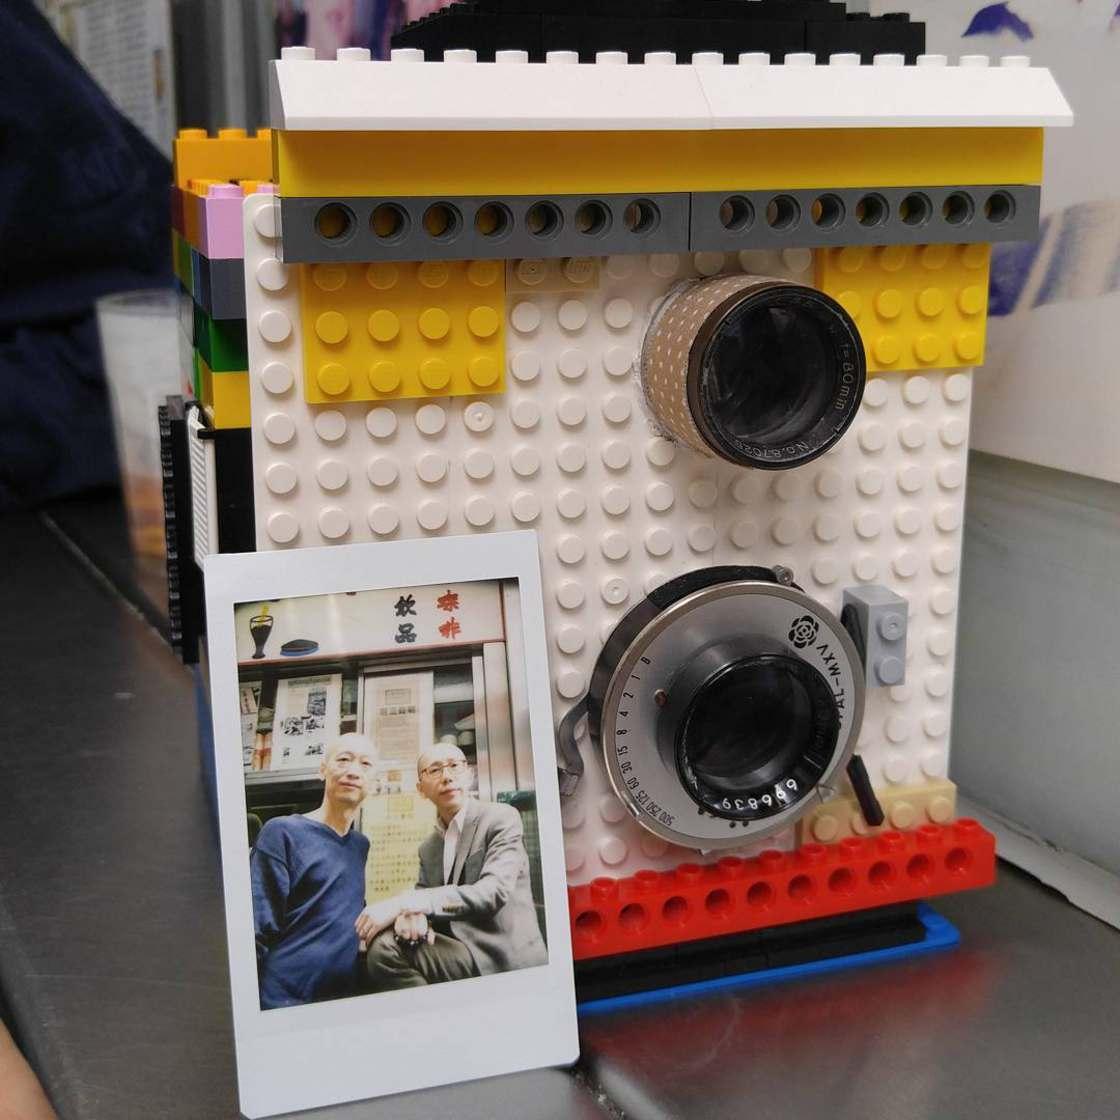 lego-instant-camera-3